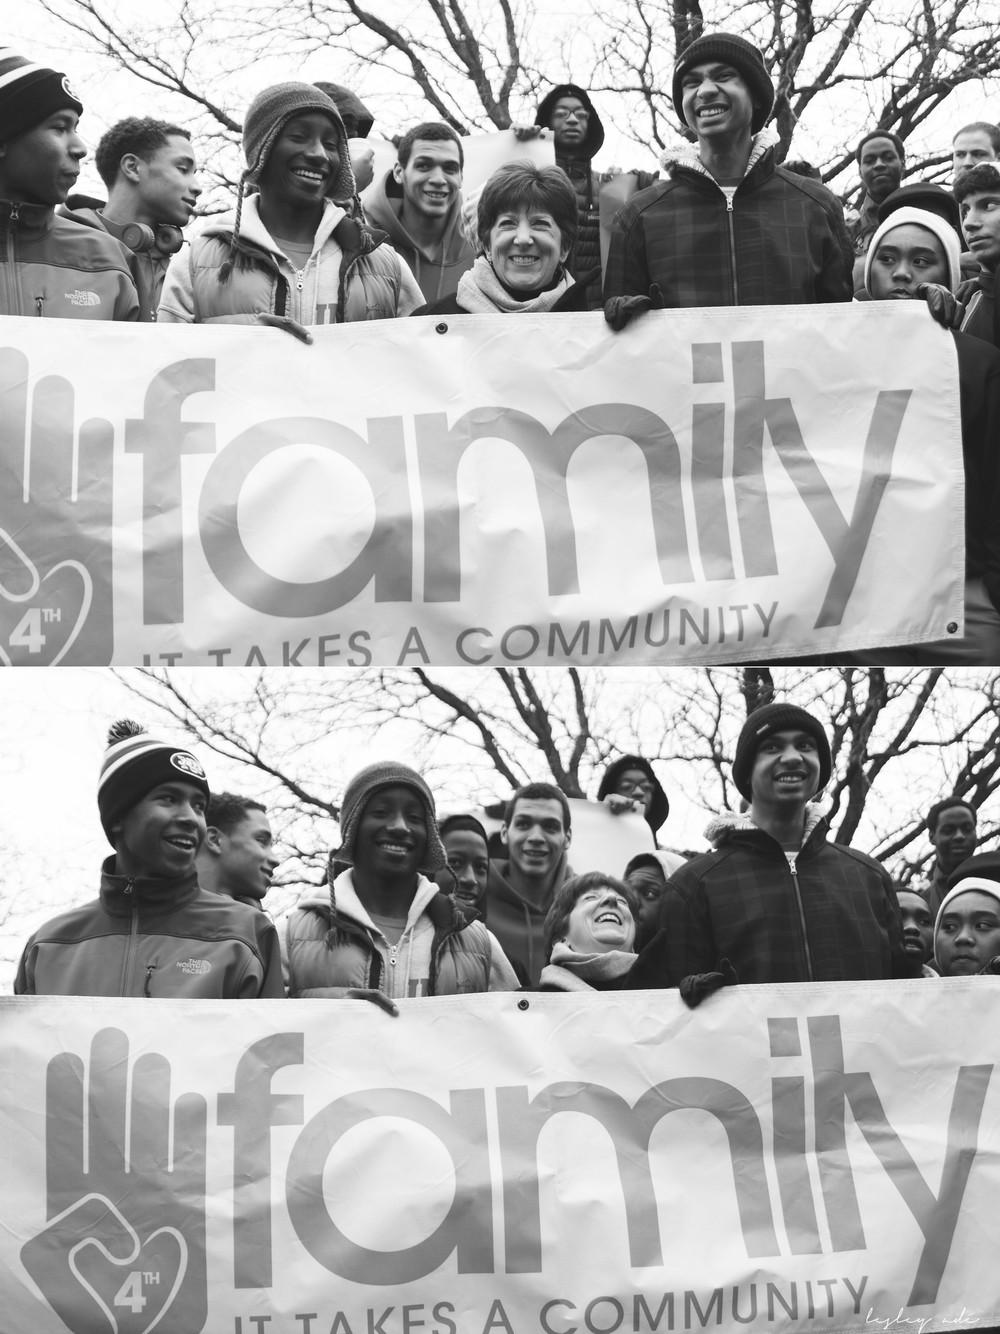 4thFamily_MLKDay2014_lesleyade_photography-28.jpg